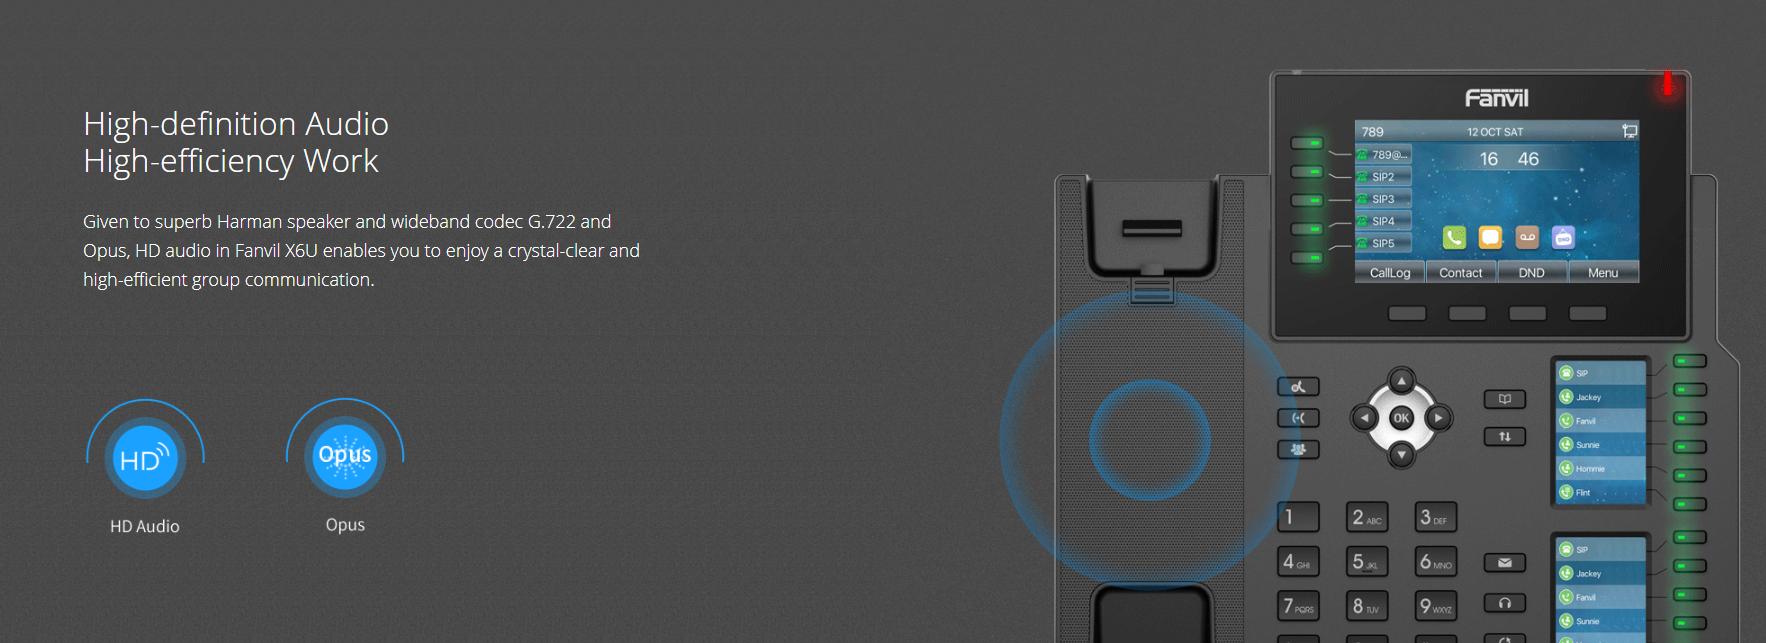 Fanvil X6U IP Phone (Gigabit, POE & Bluetooth) - Hong Kong Distributor - 香港代理